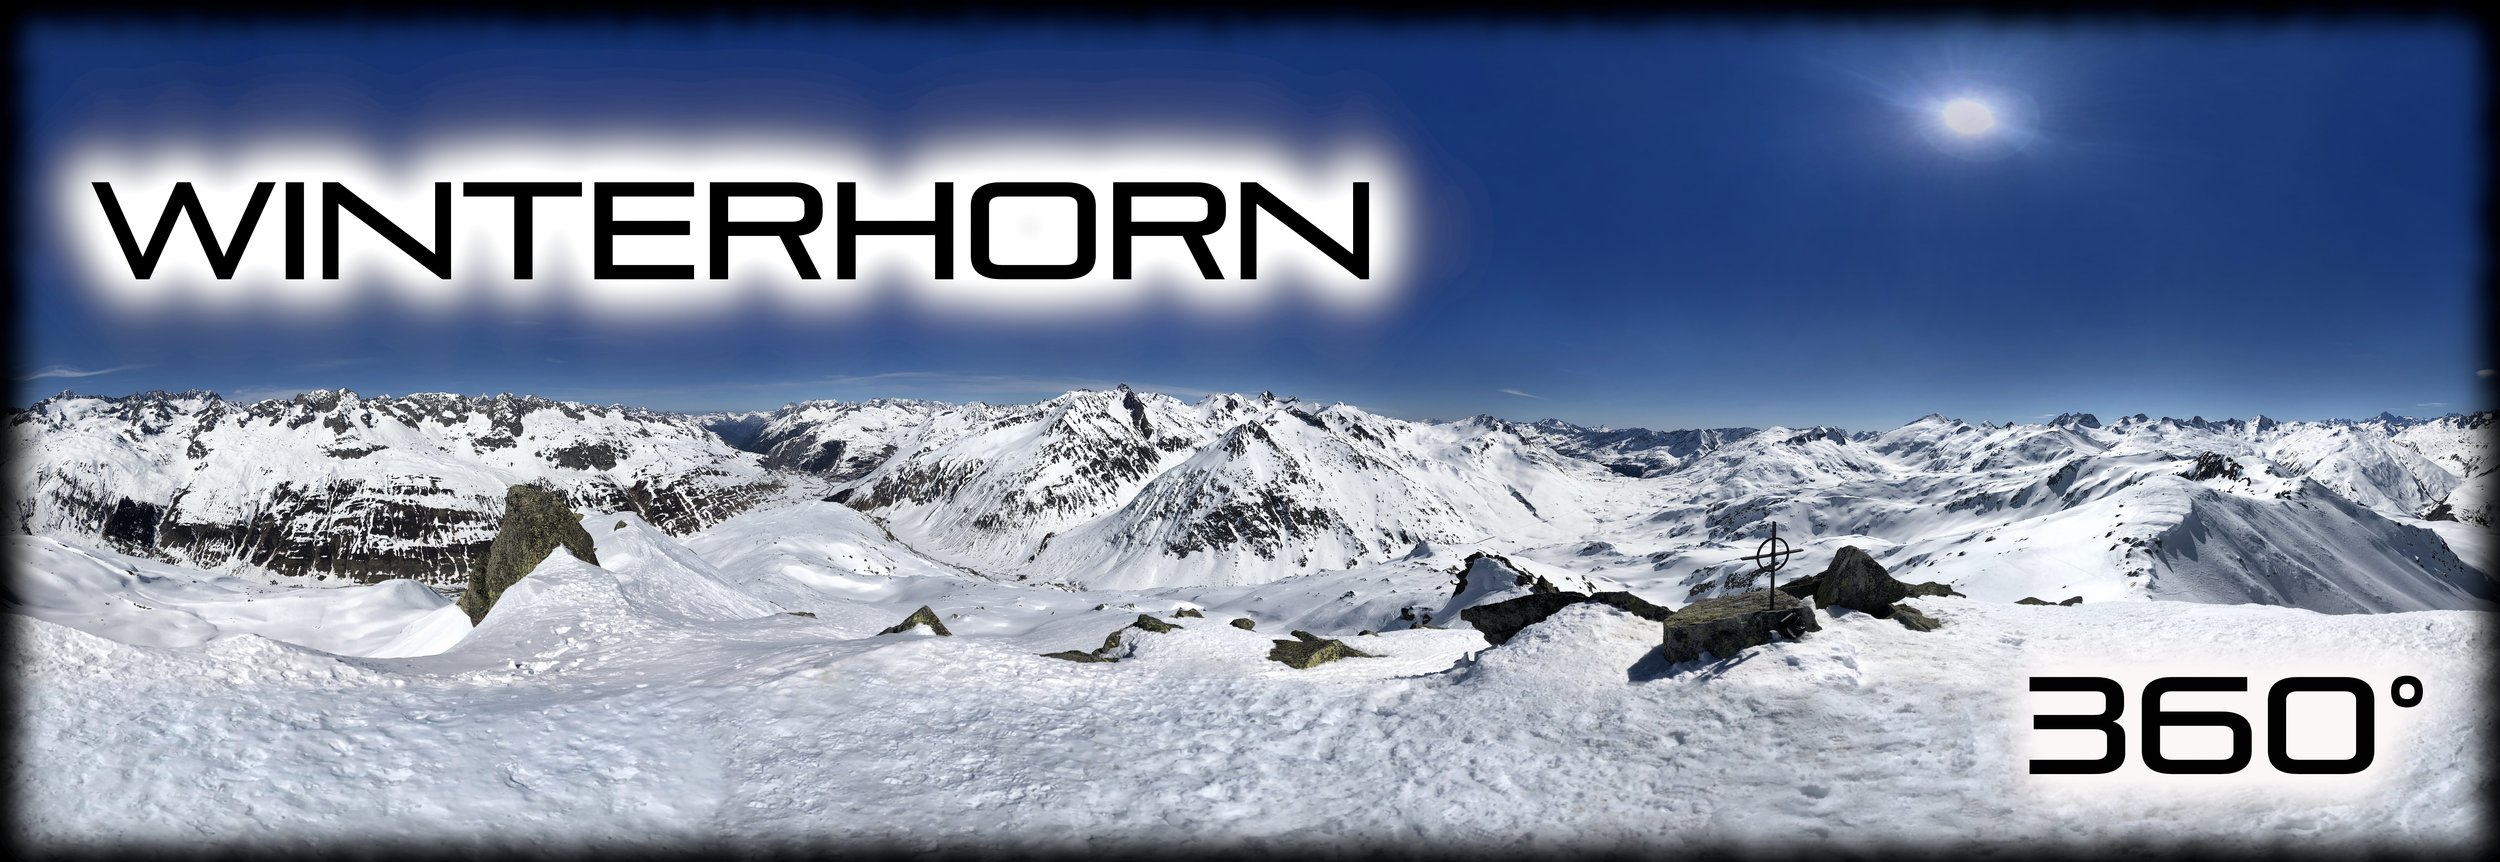 Winterhorn - Pizzo d'Orsino - 31. März 2019